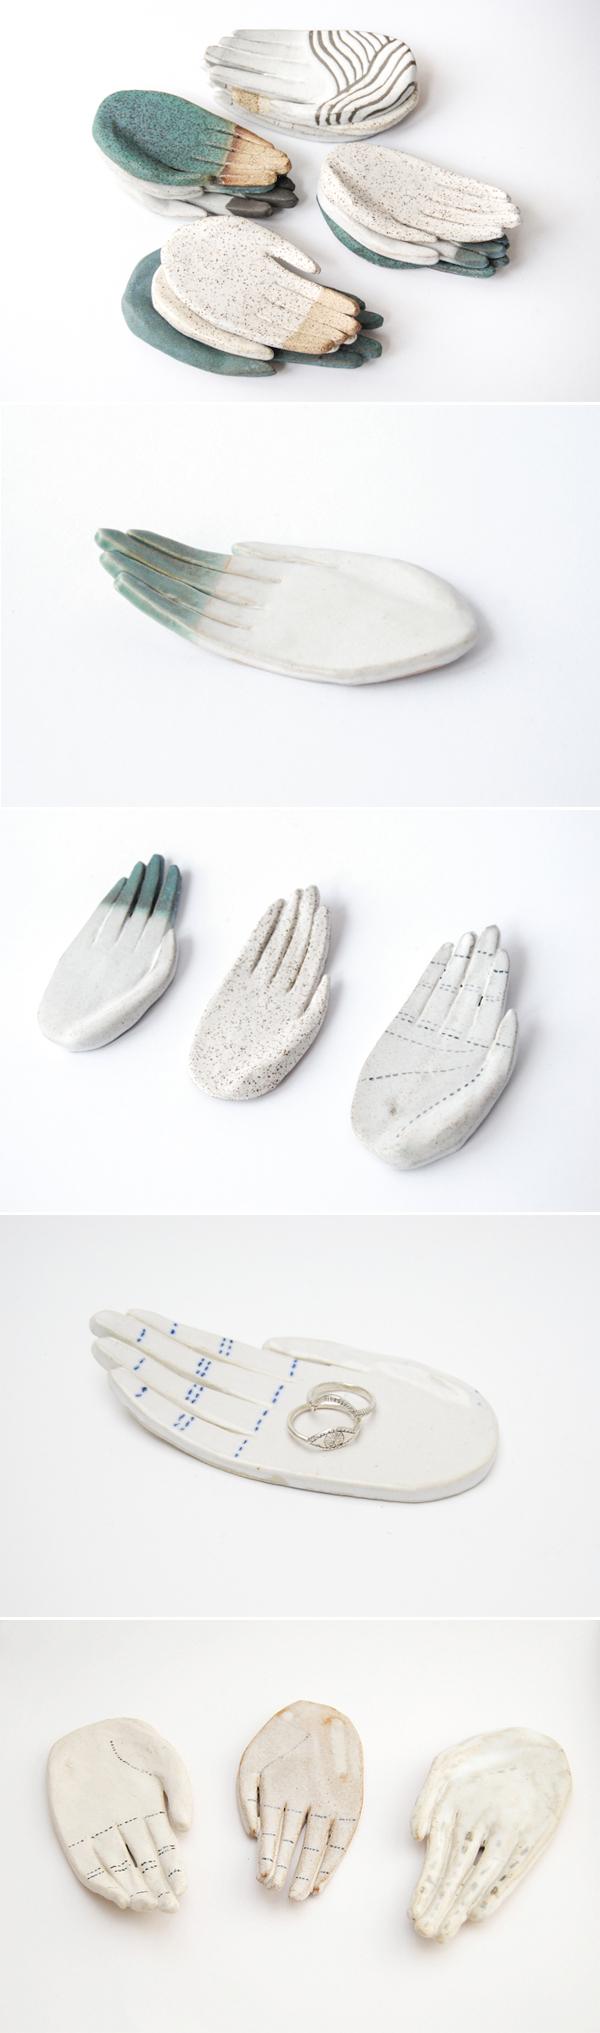 Mãos de Cerâmica da Kaye Blegvad